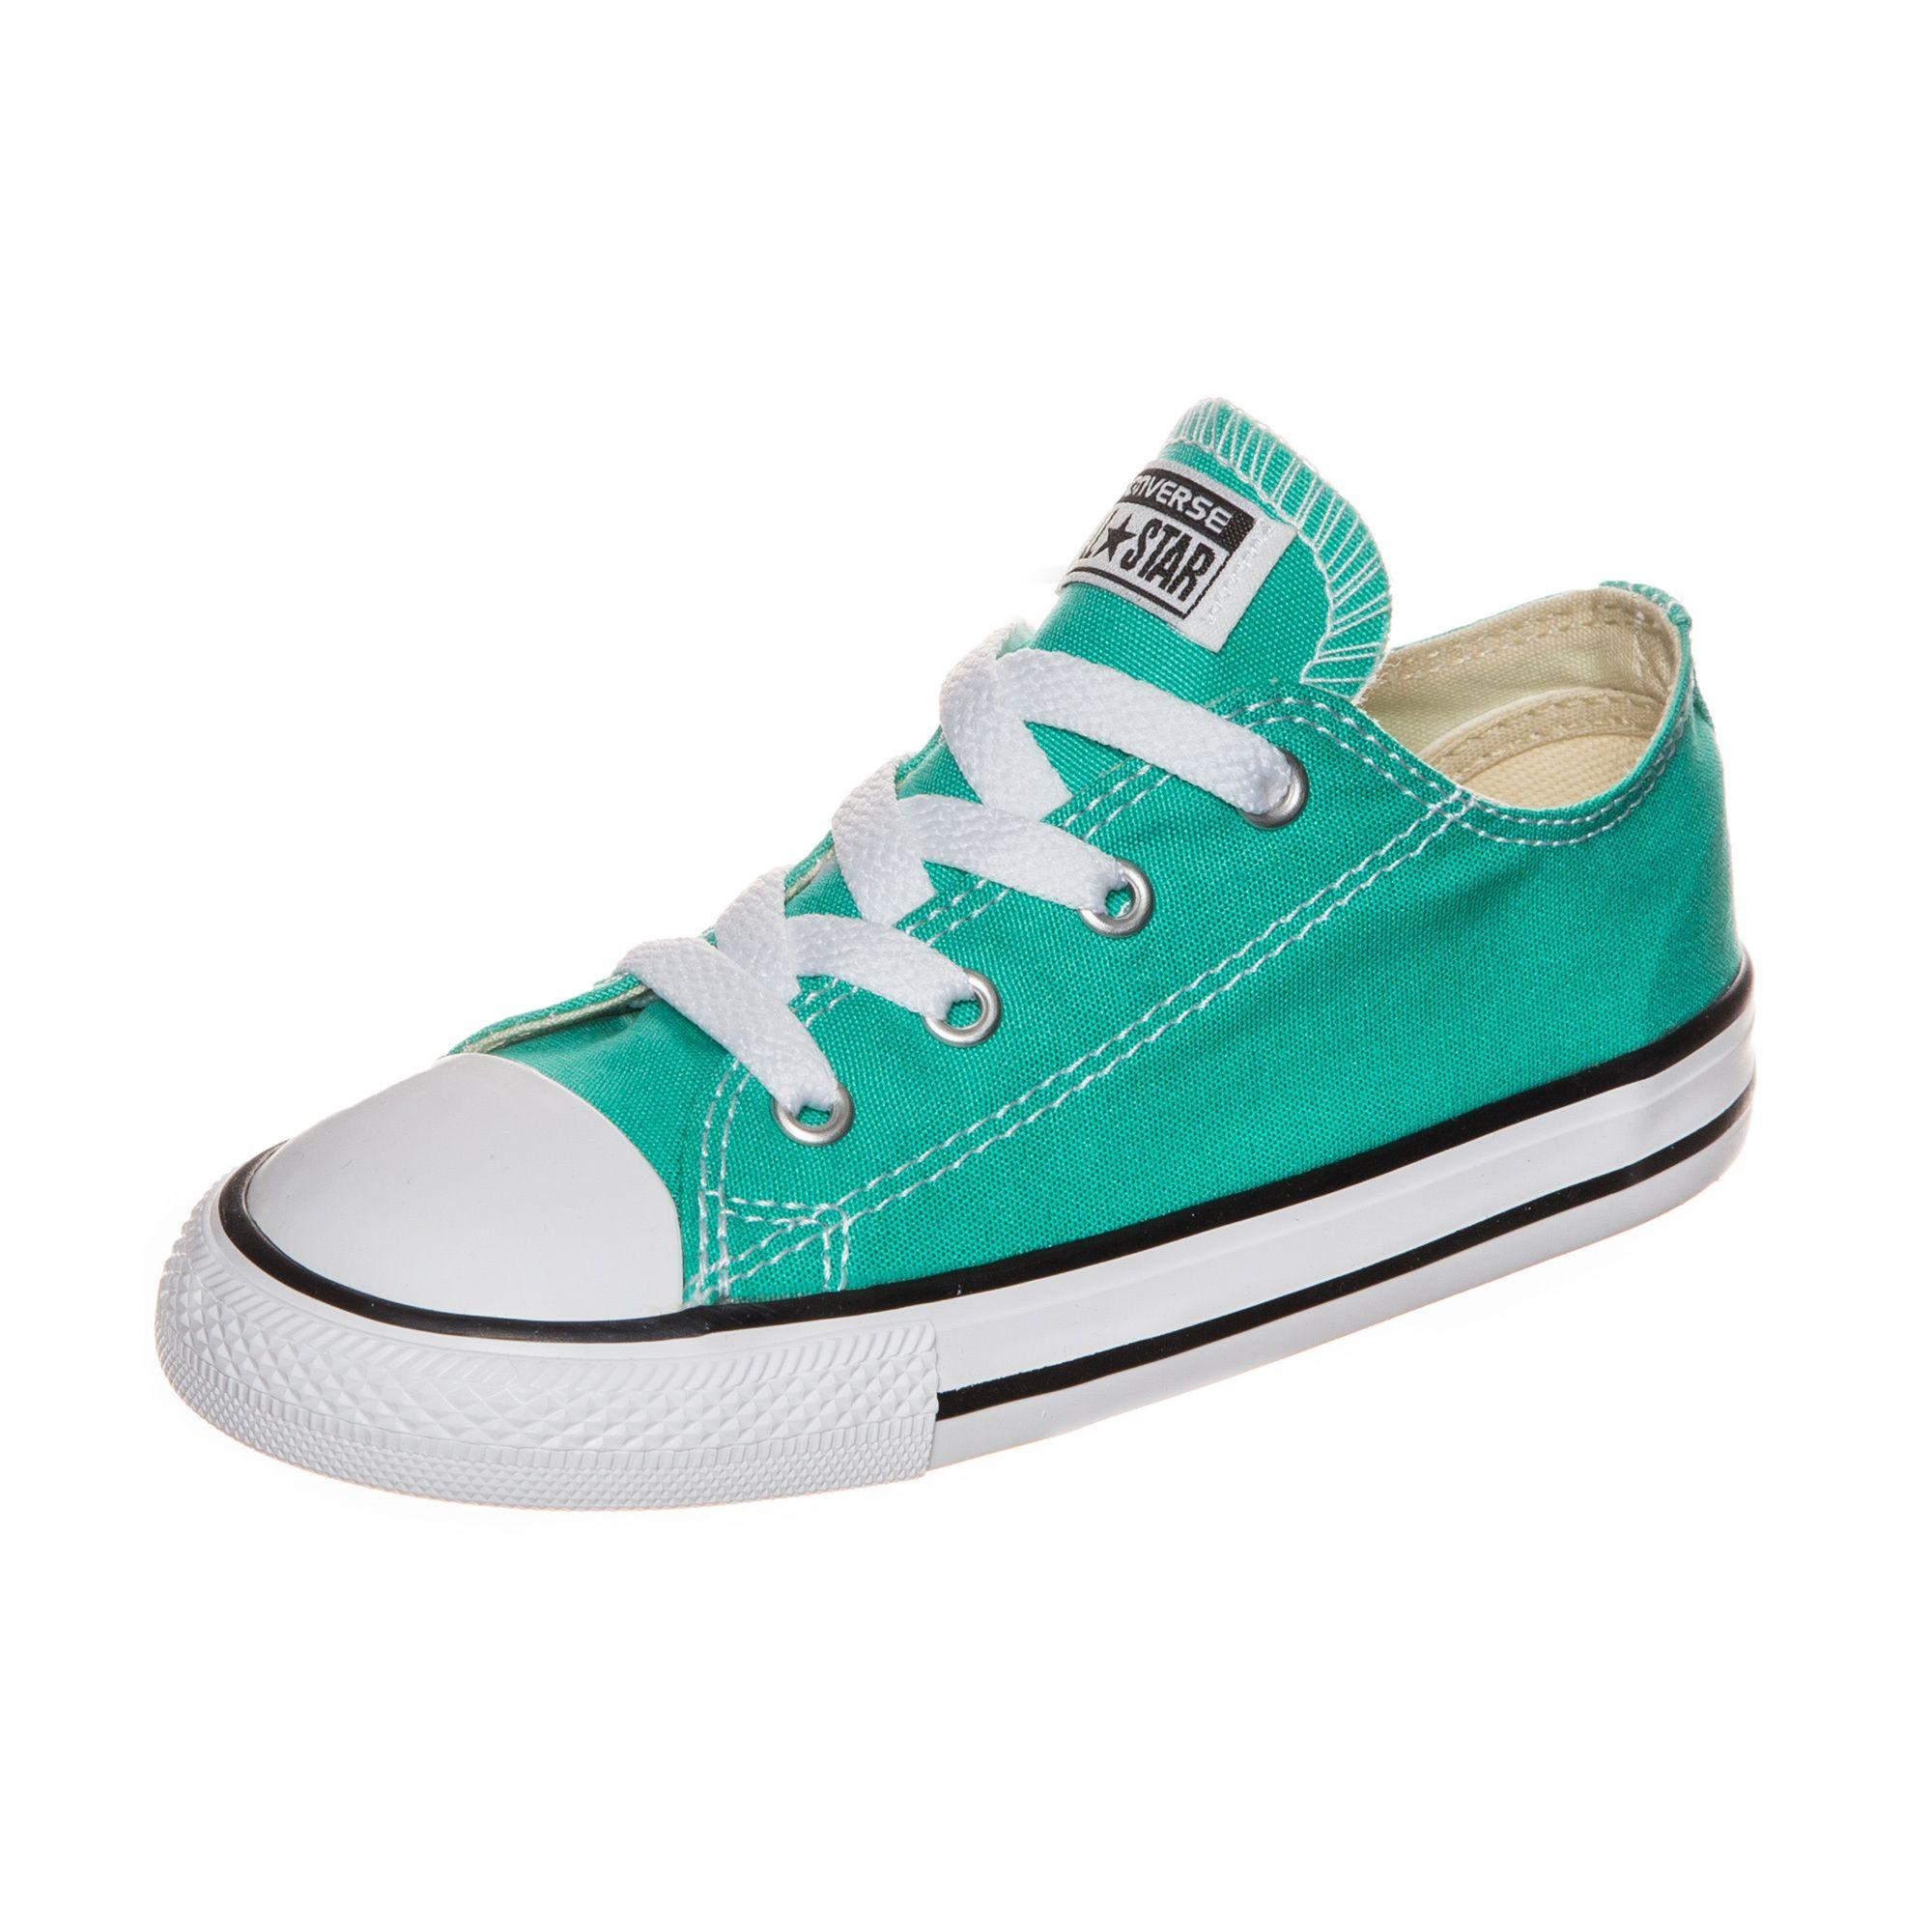 CONVERSE Converse Chuck Taylor All Star Fresh Colors OX Sneaker Kleinkinder